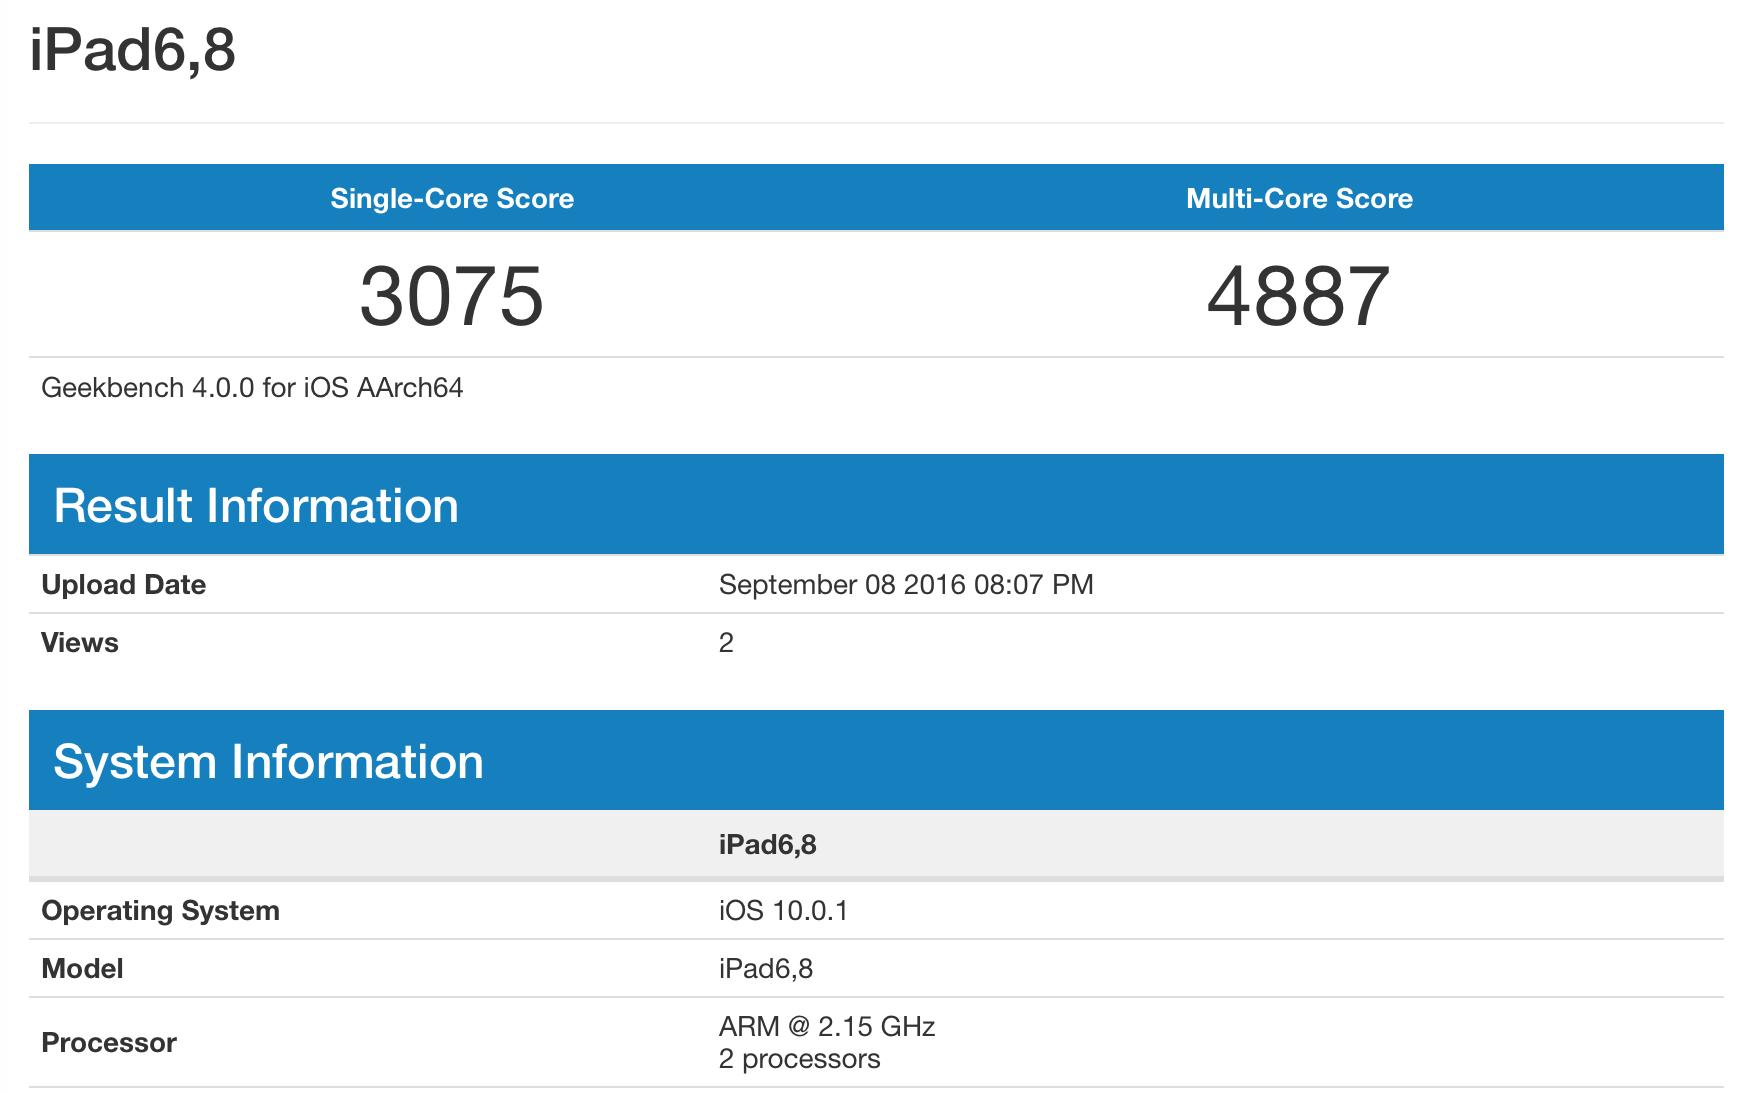 geekbench-4-ipad-pro-12-9%22-compare